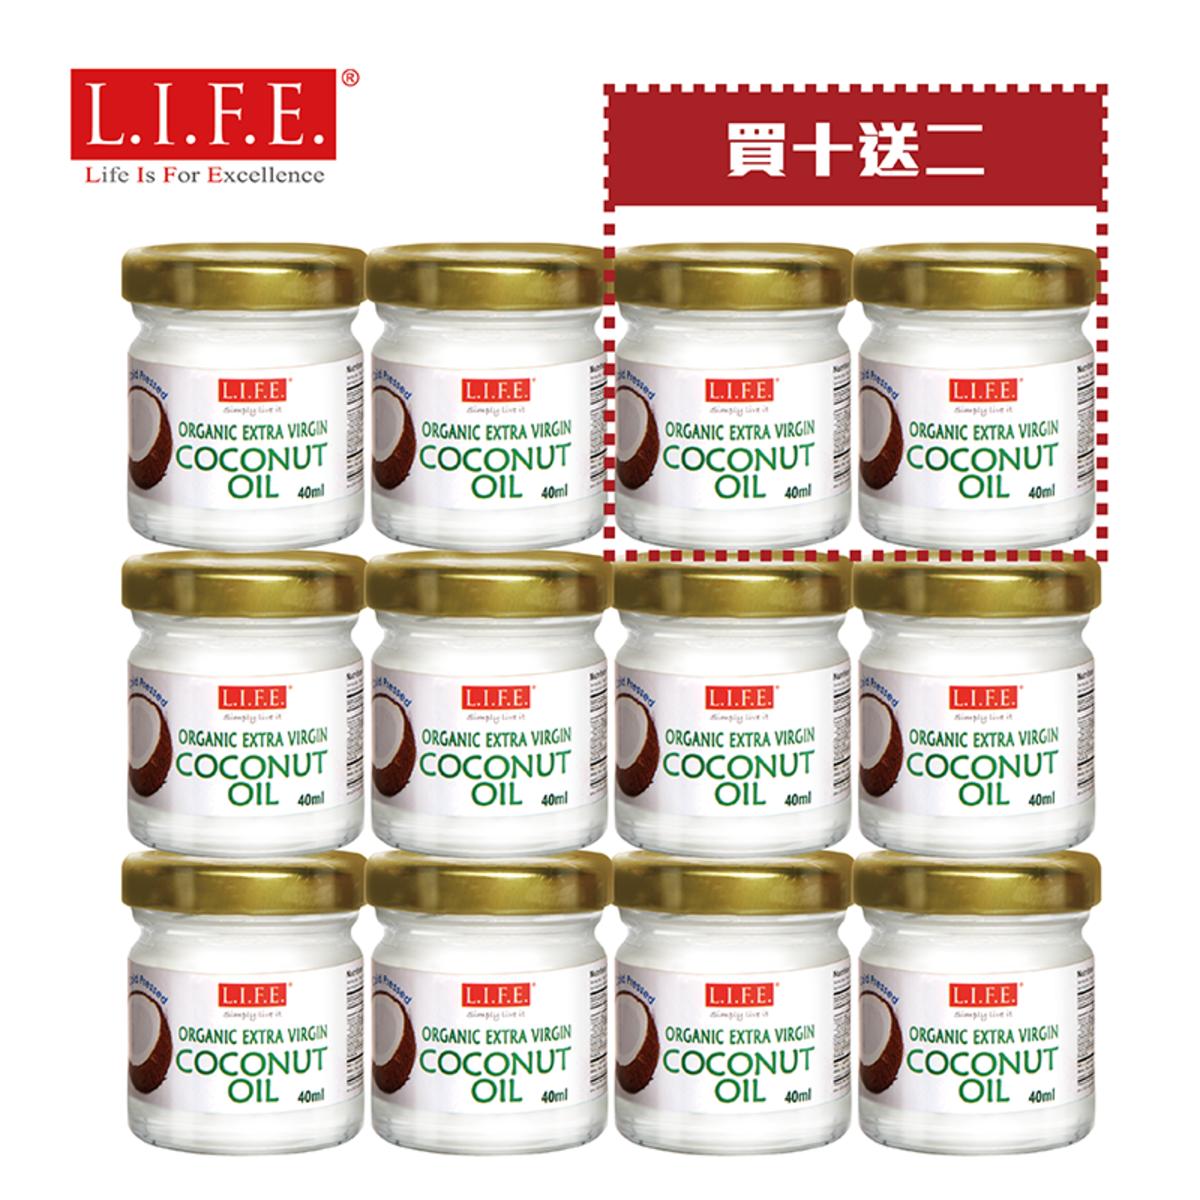 F&B Extra Virgin Organic Coconut Oil 40ml x 12